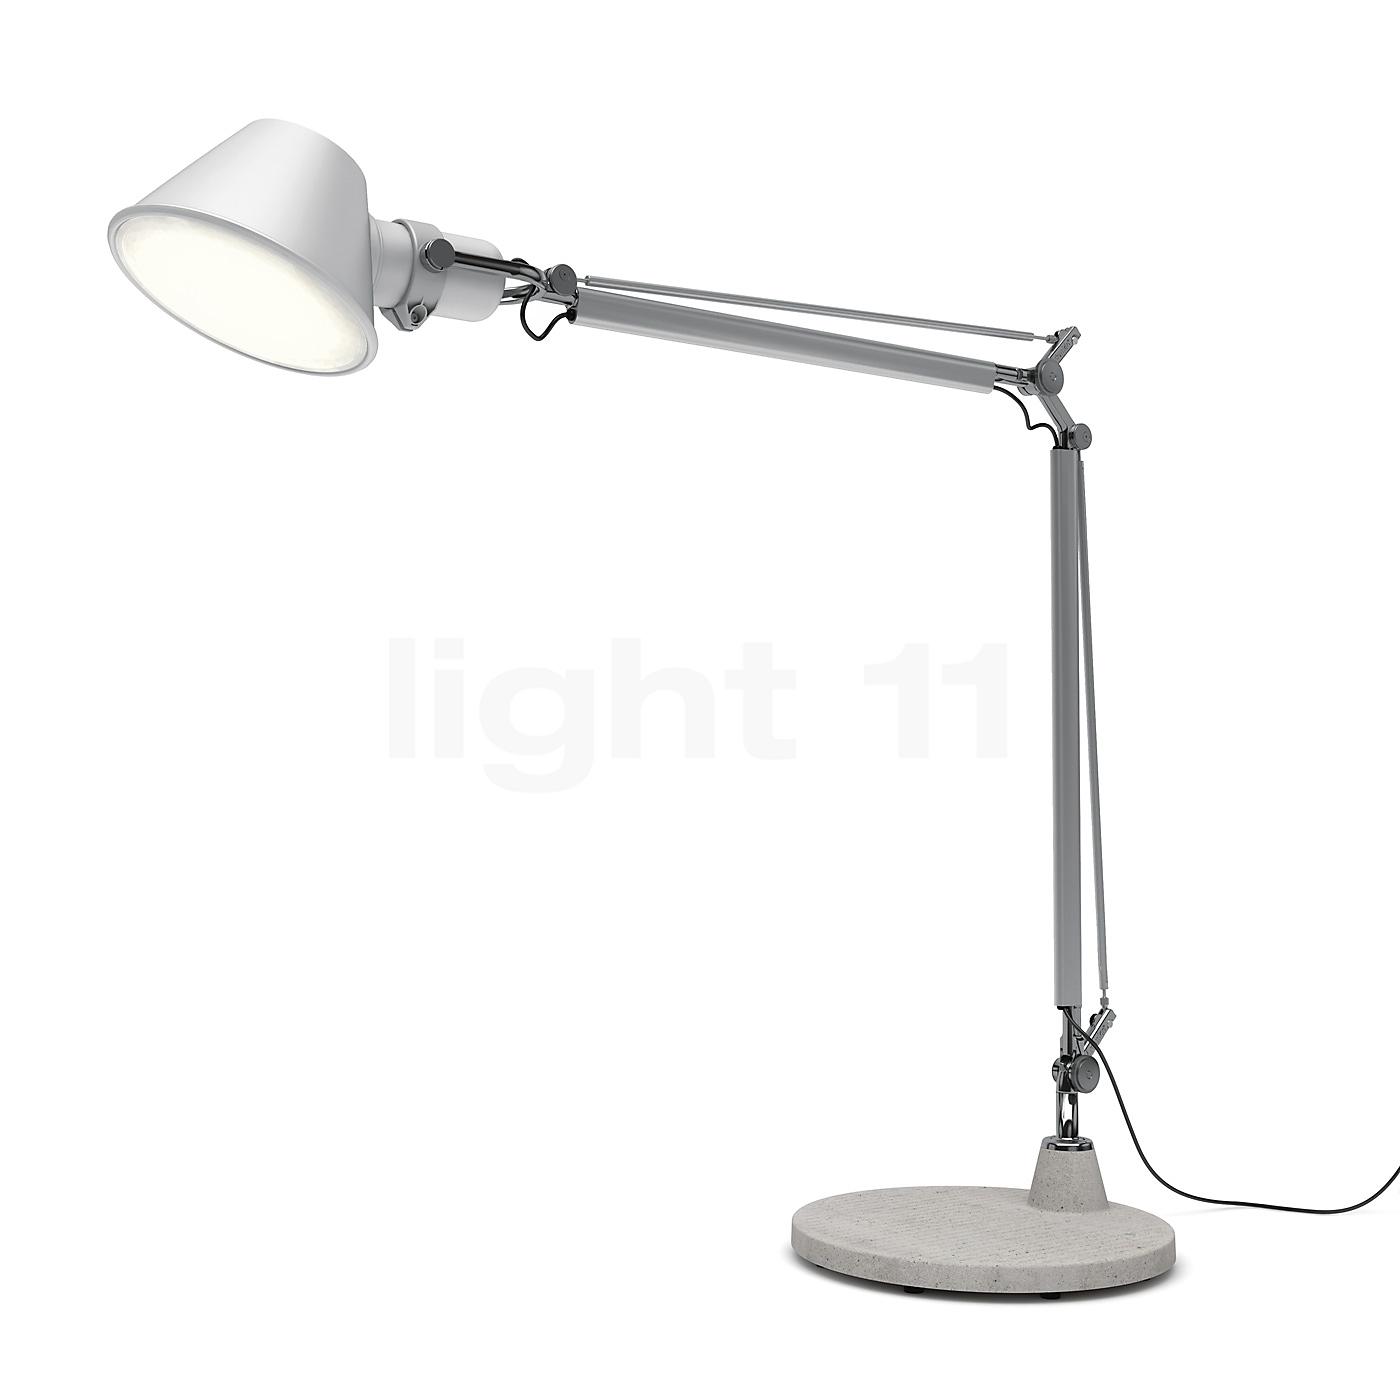 artemide tolomeo xxl lampadaire en vente sur. Black Bedroom Furniture Sets. Home Design Ideas